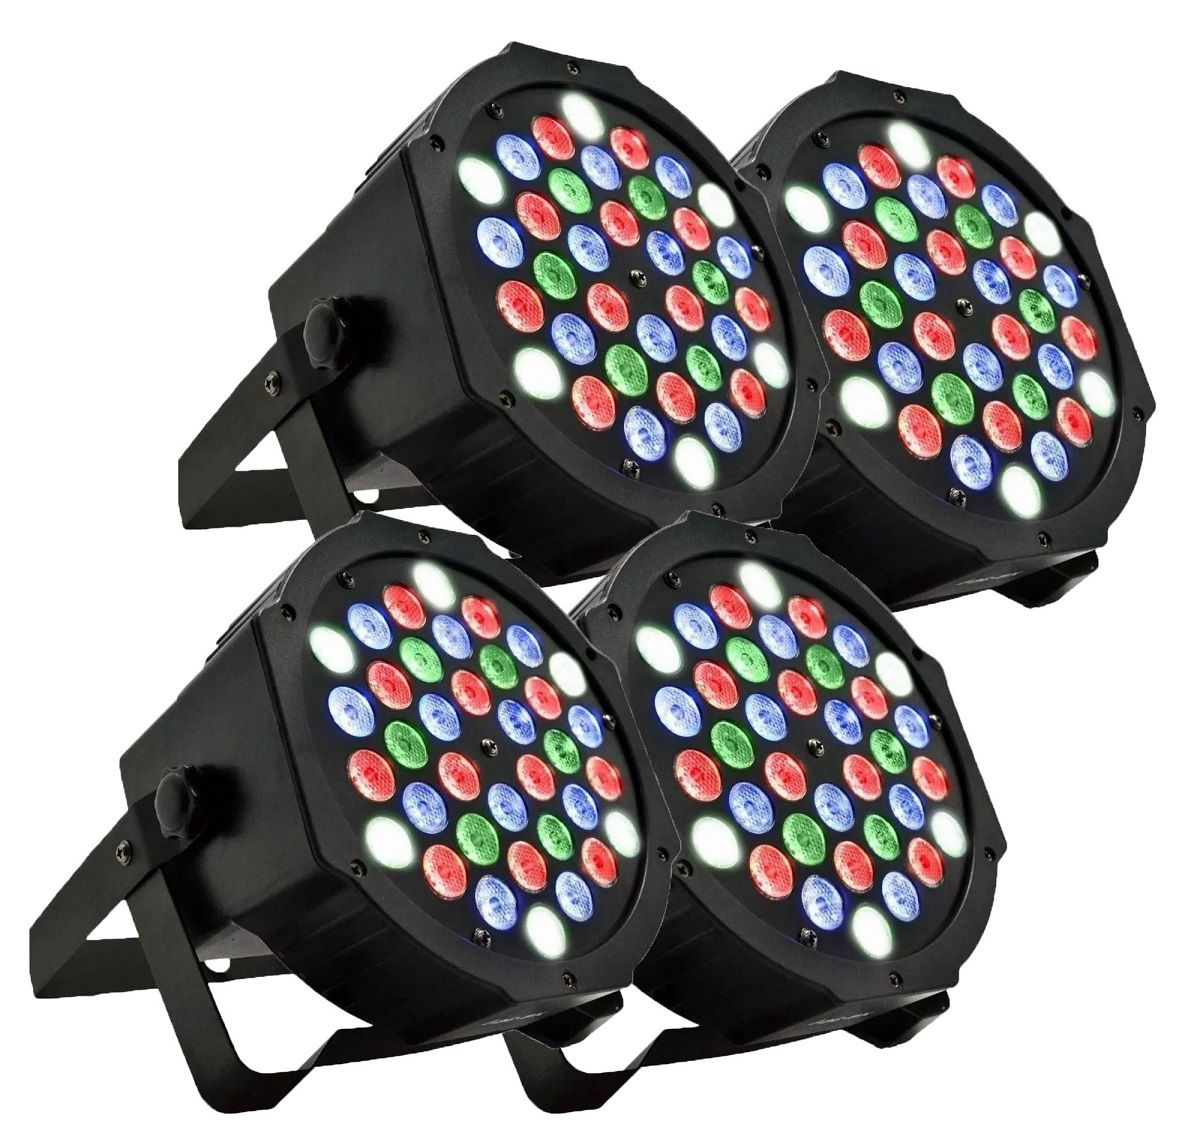 Kit 4 Canhão de Luz Led par 64 RGB 36 Leds DMX Digital Strobo Slim - FULLFILMENT JULINETSHOP